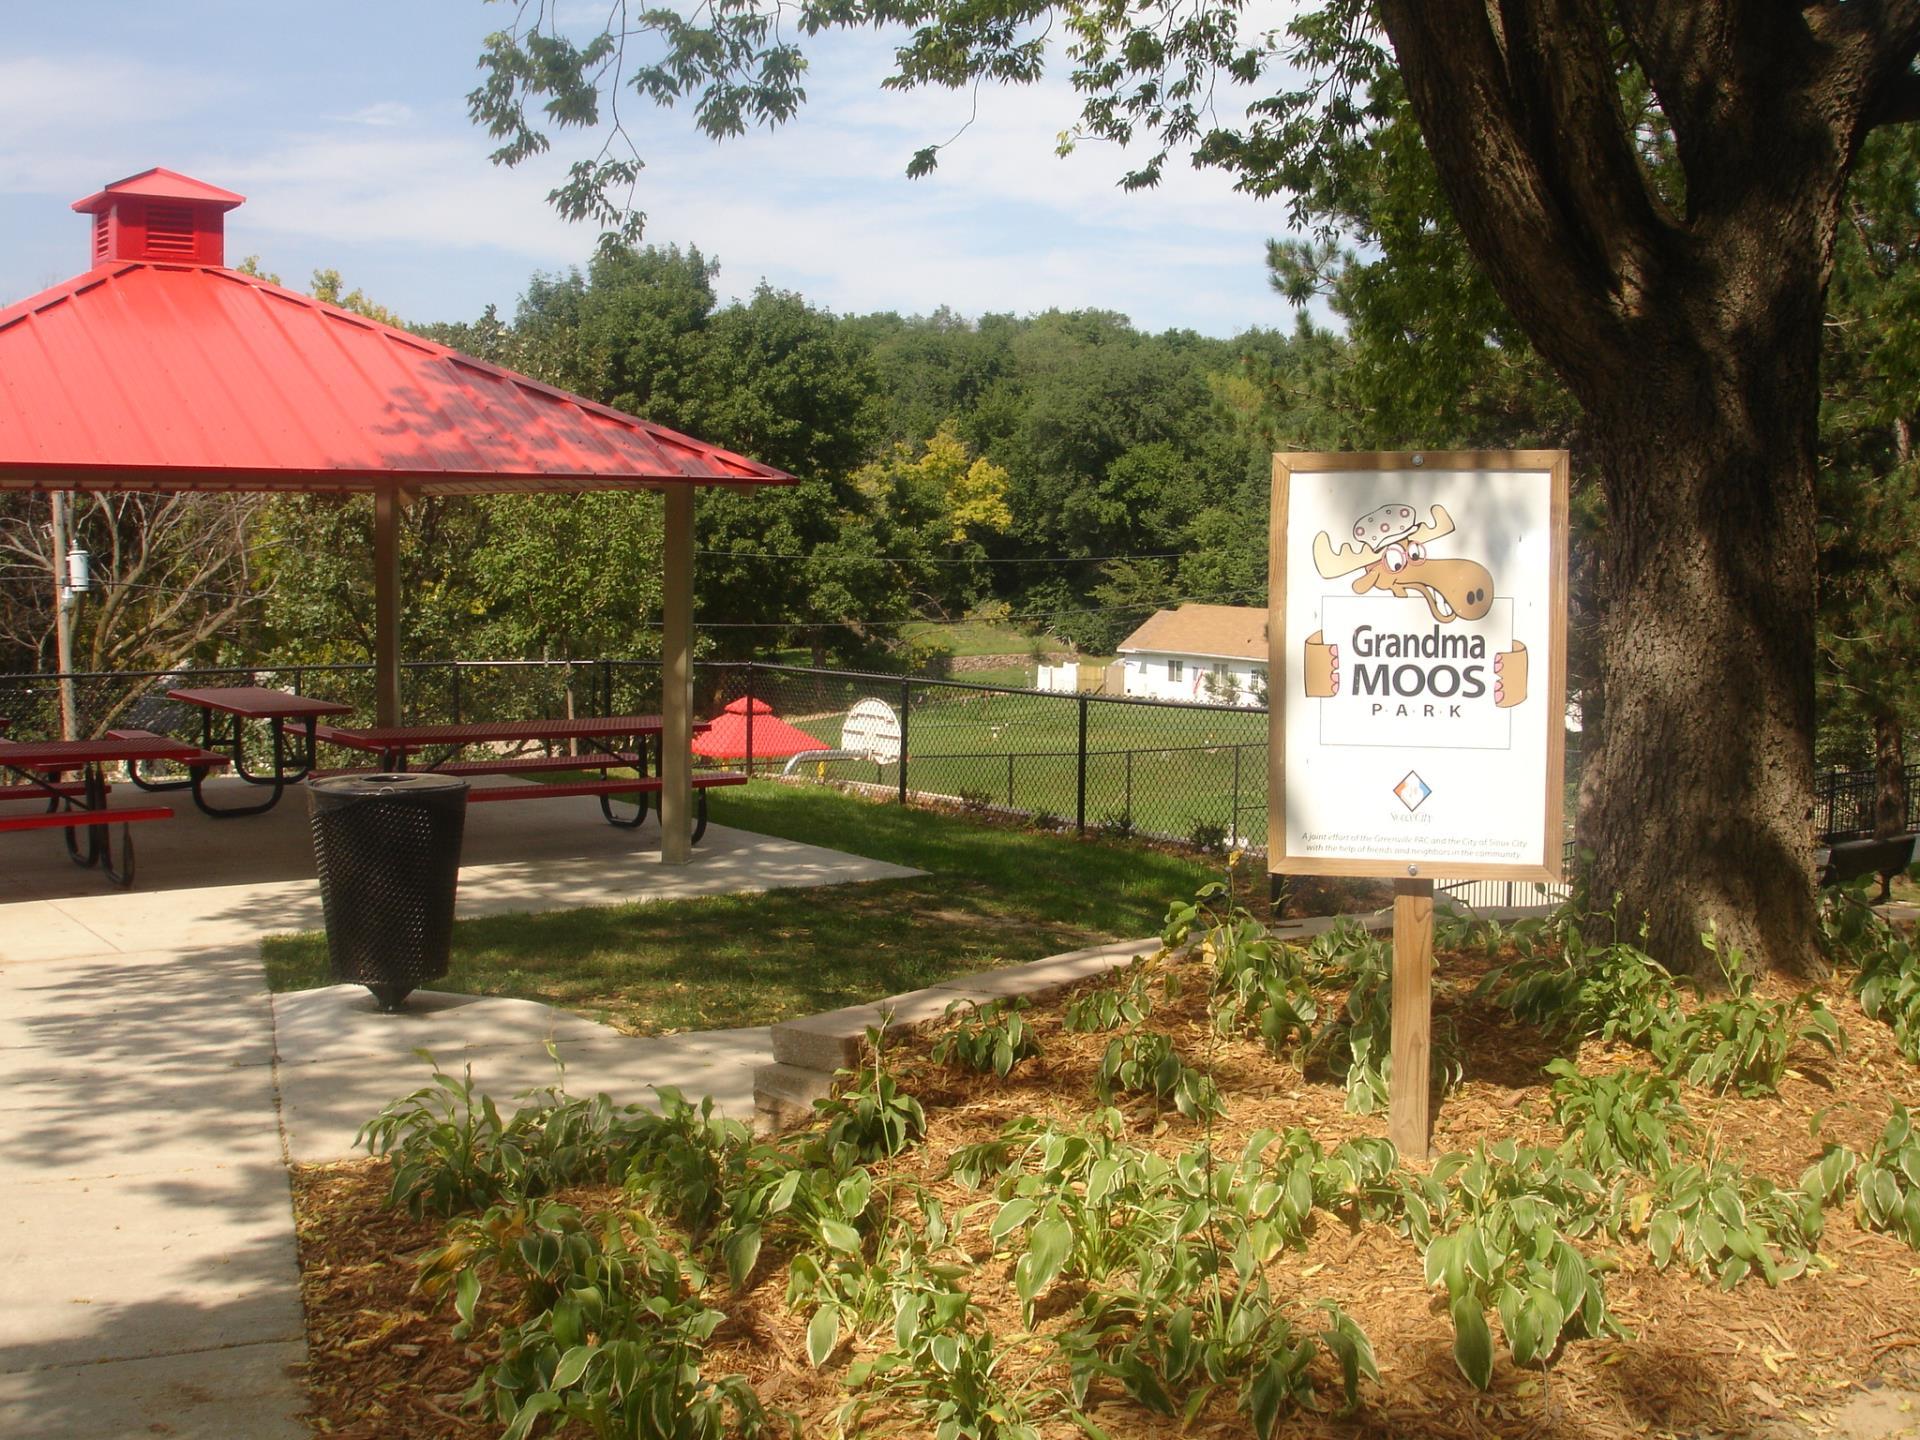 Grandma Moos\' Park | Parks & Amenities | City of Sioux City website